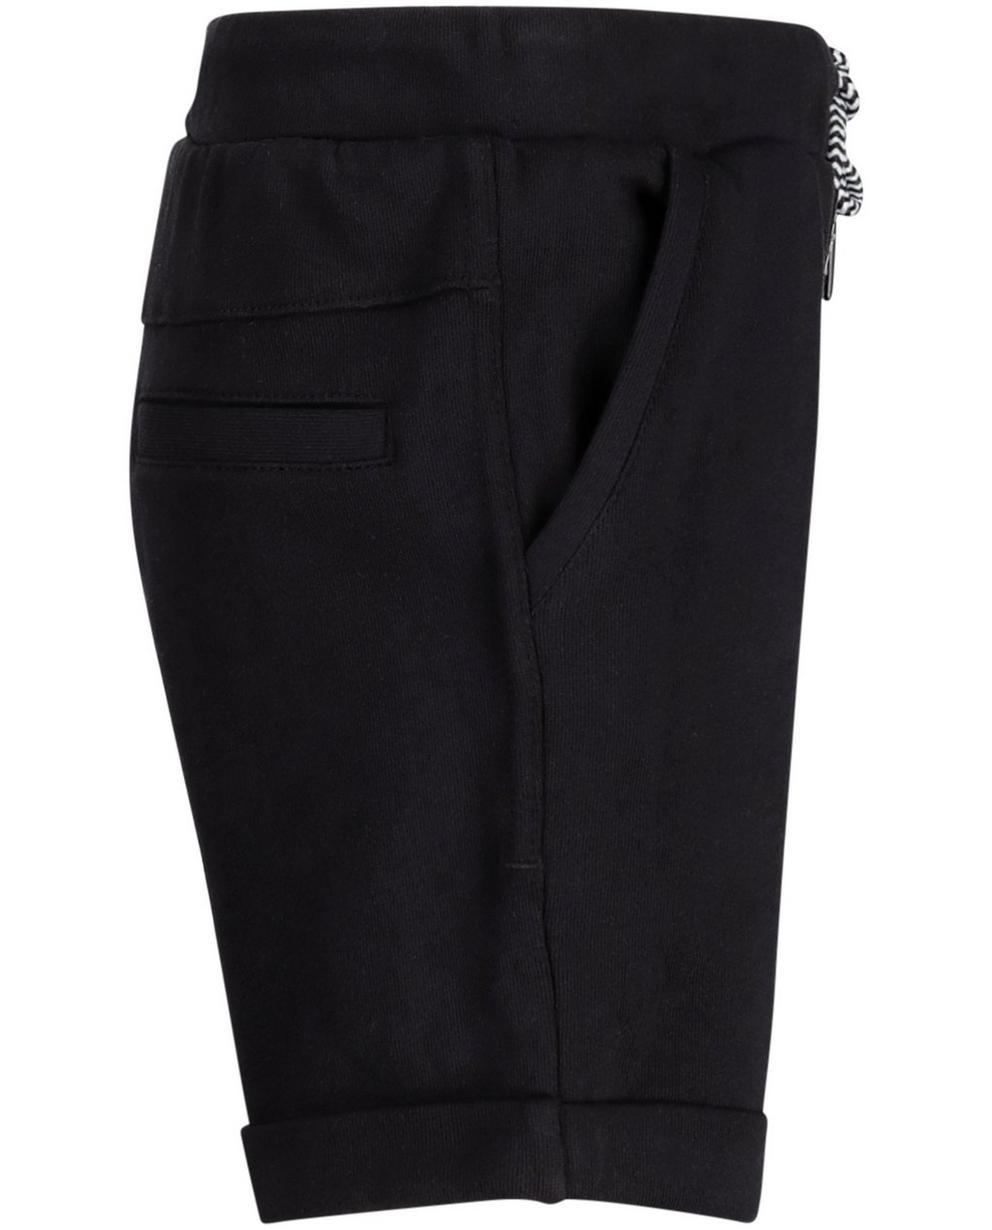 Shorts - Schwarz -